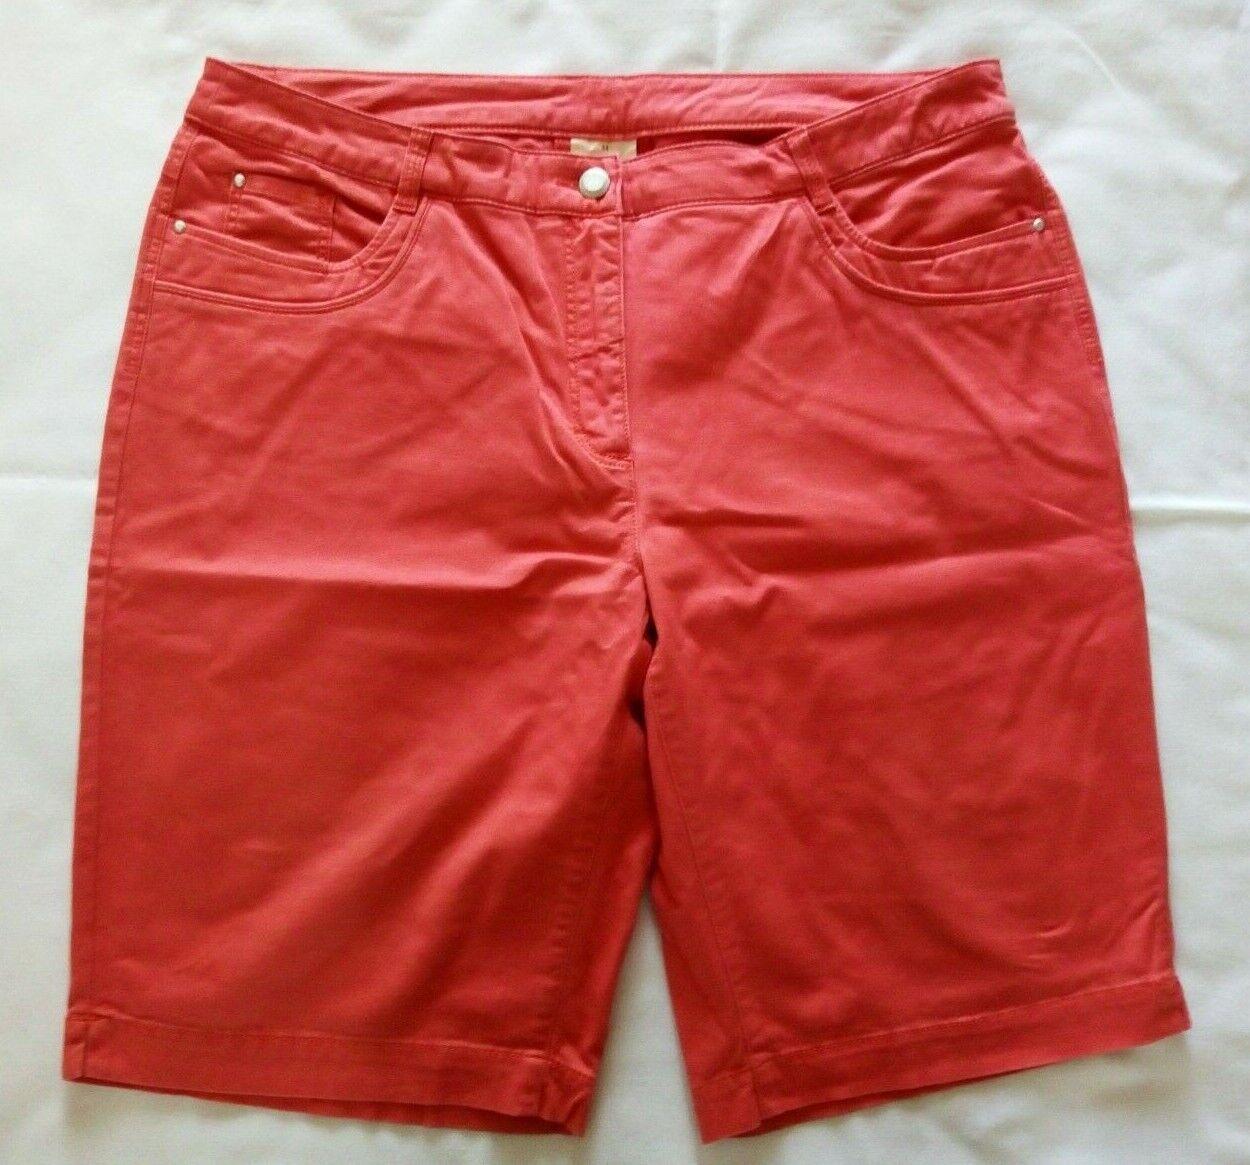 Adagio Sommer Shorts Bermuda Gr.44 Baumwolle Elasthan koralle- UVP34,99 NEU